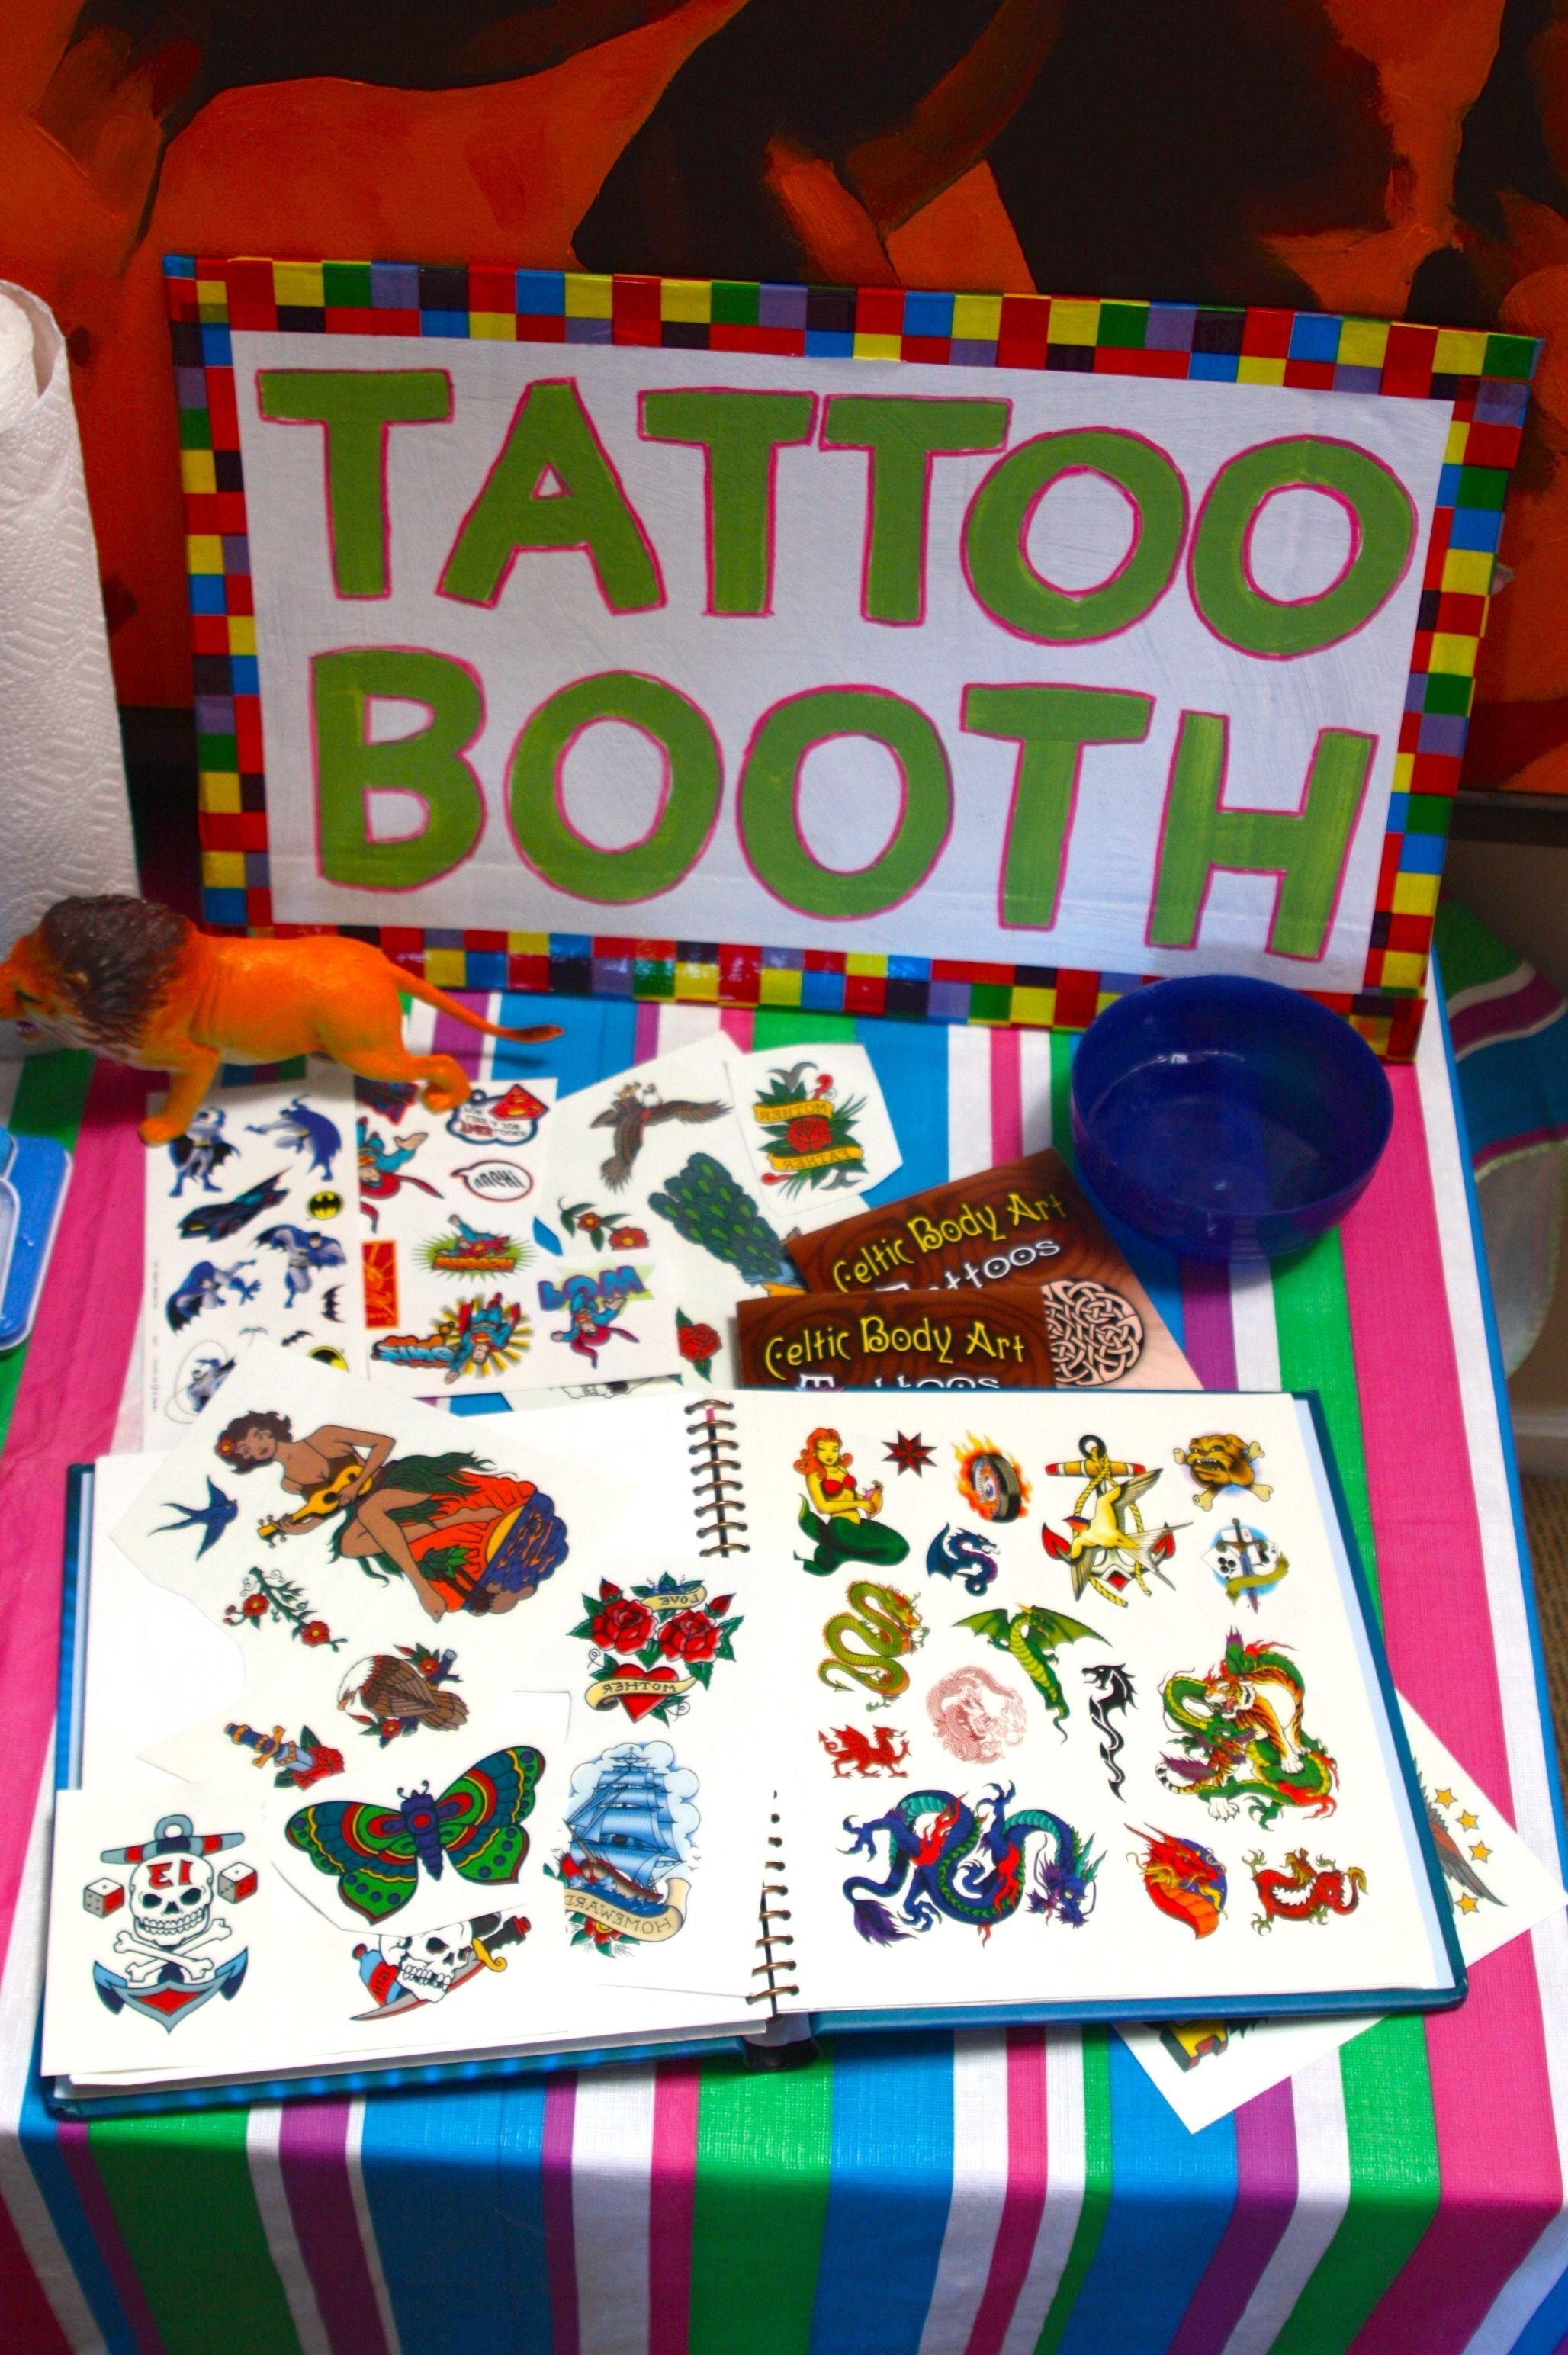 10 Nice Halloween Party Game Ideas For Adults f09f8e88 fiestas infantiles f09f8e82 91 ideas de cumpleanos f09f8e81 tattoo 7